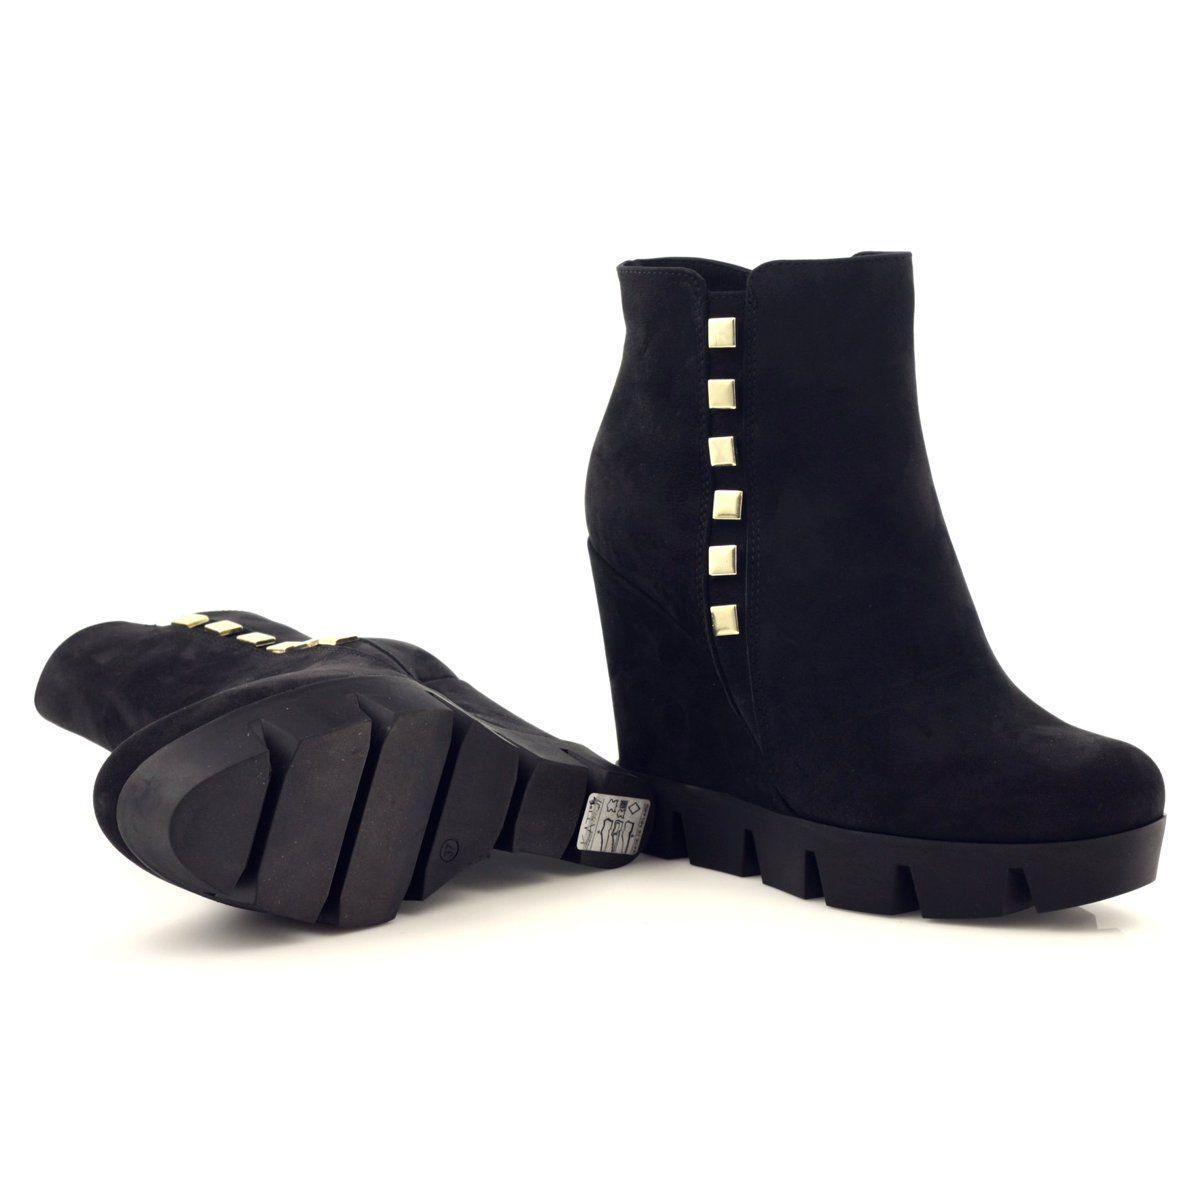 Botki Buty Damskie Zimowe Na Koturnie Kati Czarne Boots Rain Boots Shoes